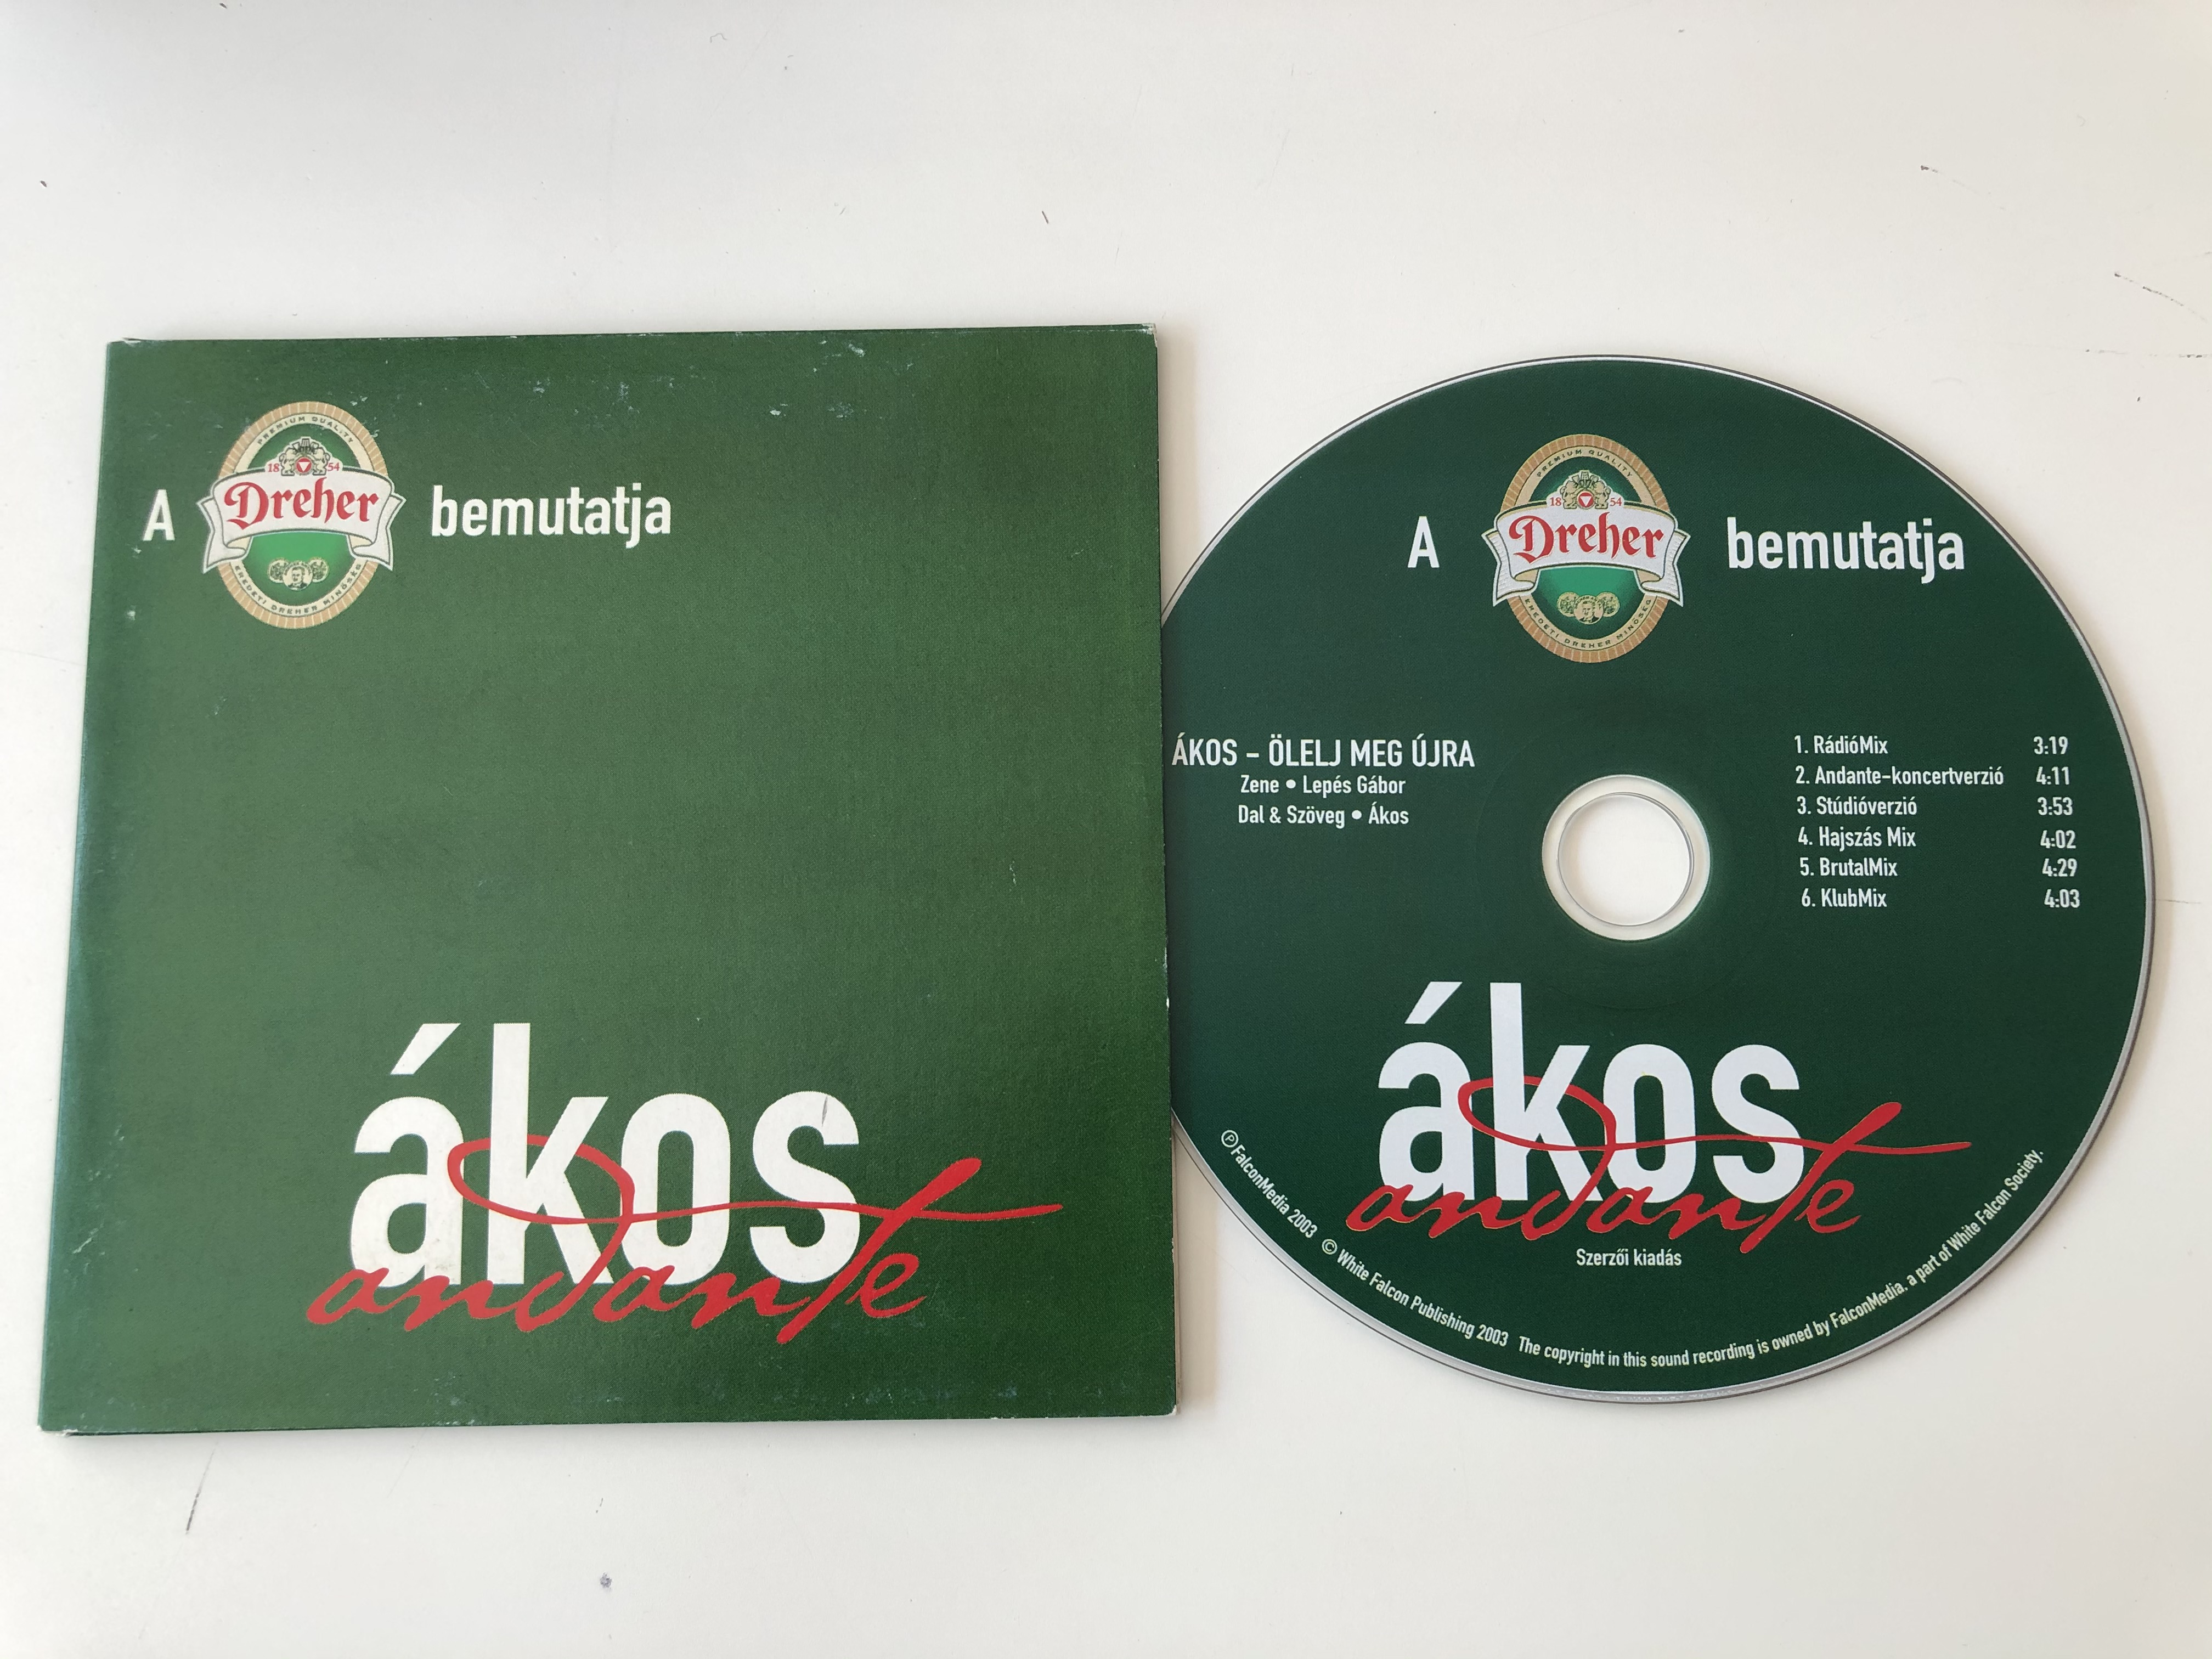 a-dreher-bemutatja-kos-adante-falconmedia-audio-cd-2003-5998638323323-2-.jpg